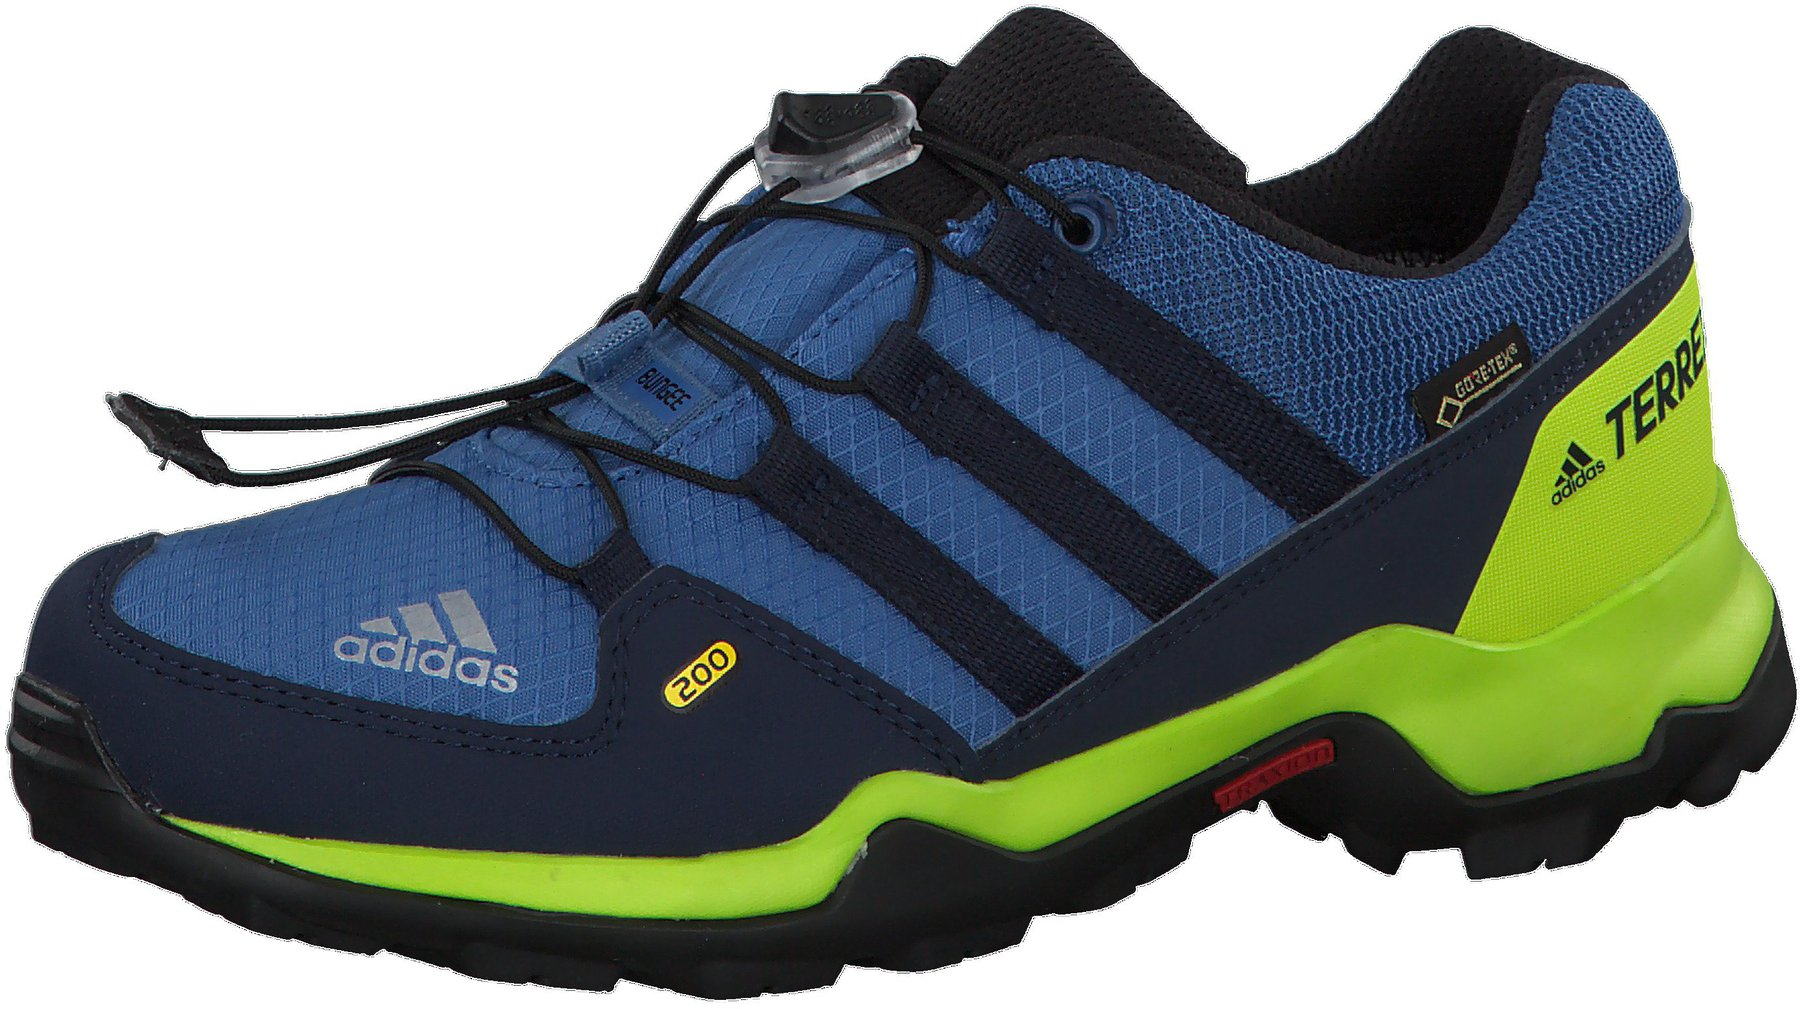 Adidas Terrex Low GTX K trace royal/collegiate navy/solar slime